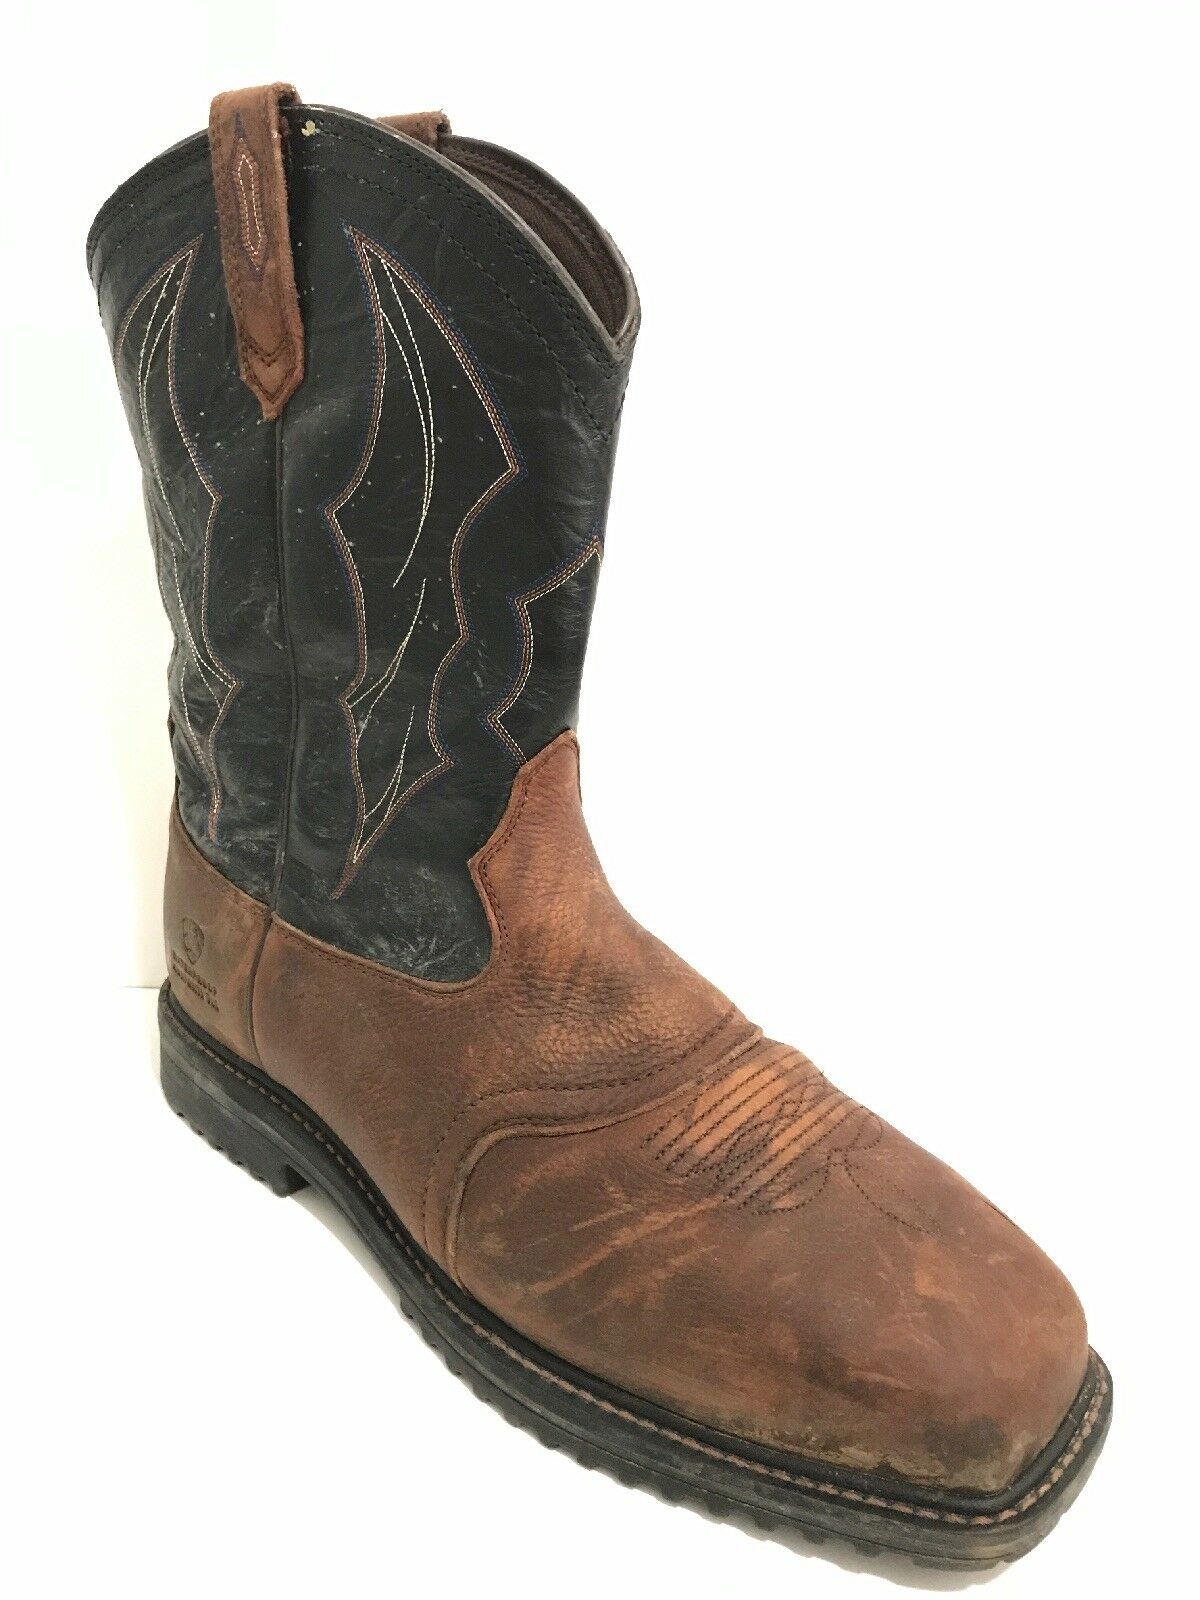 Men's Ariat 10012932 RigTek Wide Square Toe Waterproof, Composite Toe Size 14 EE